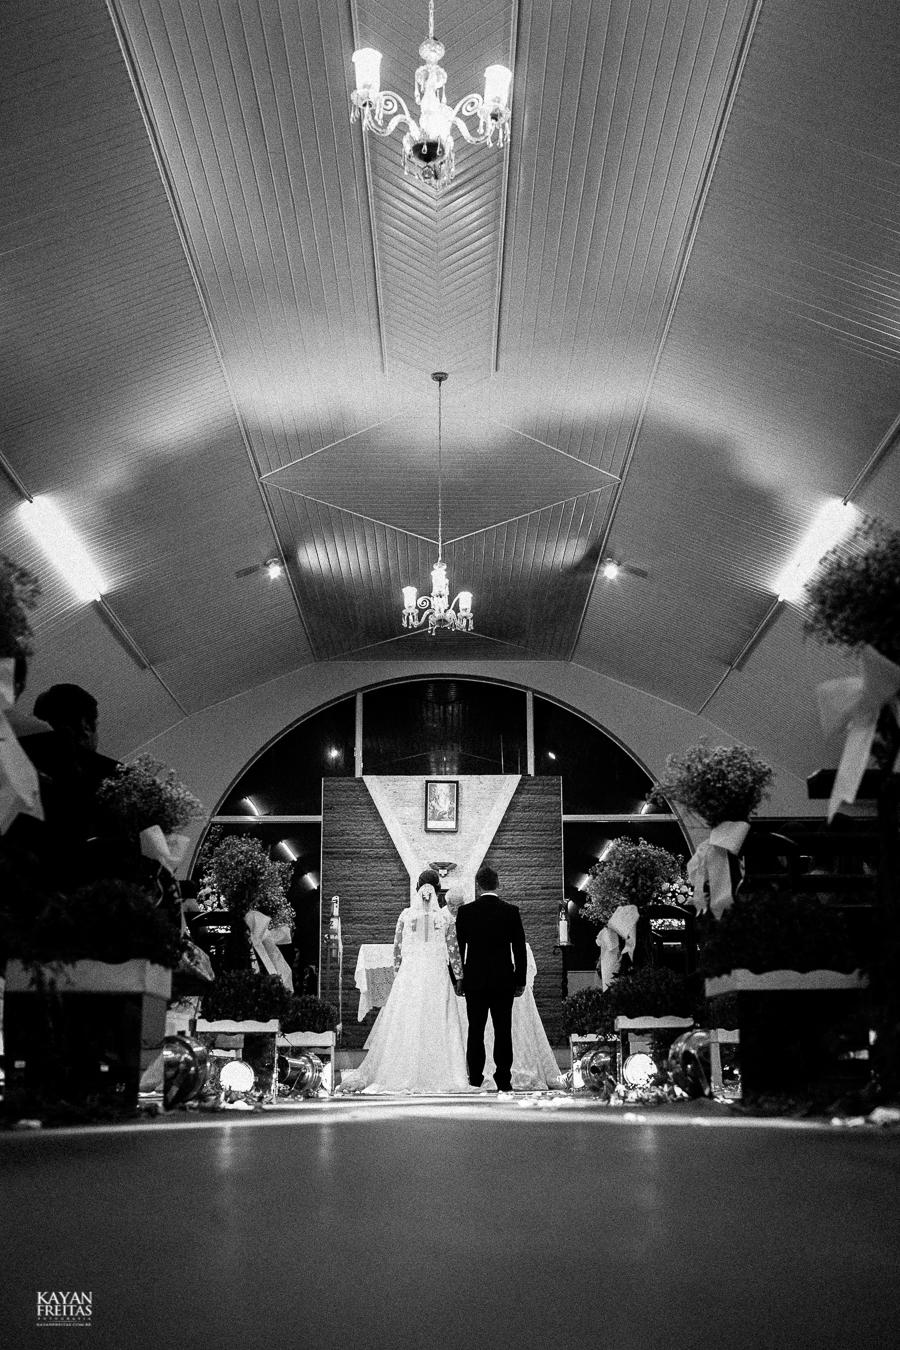 casamento-andressa-andre-0072